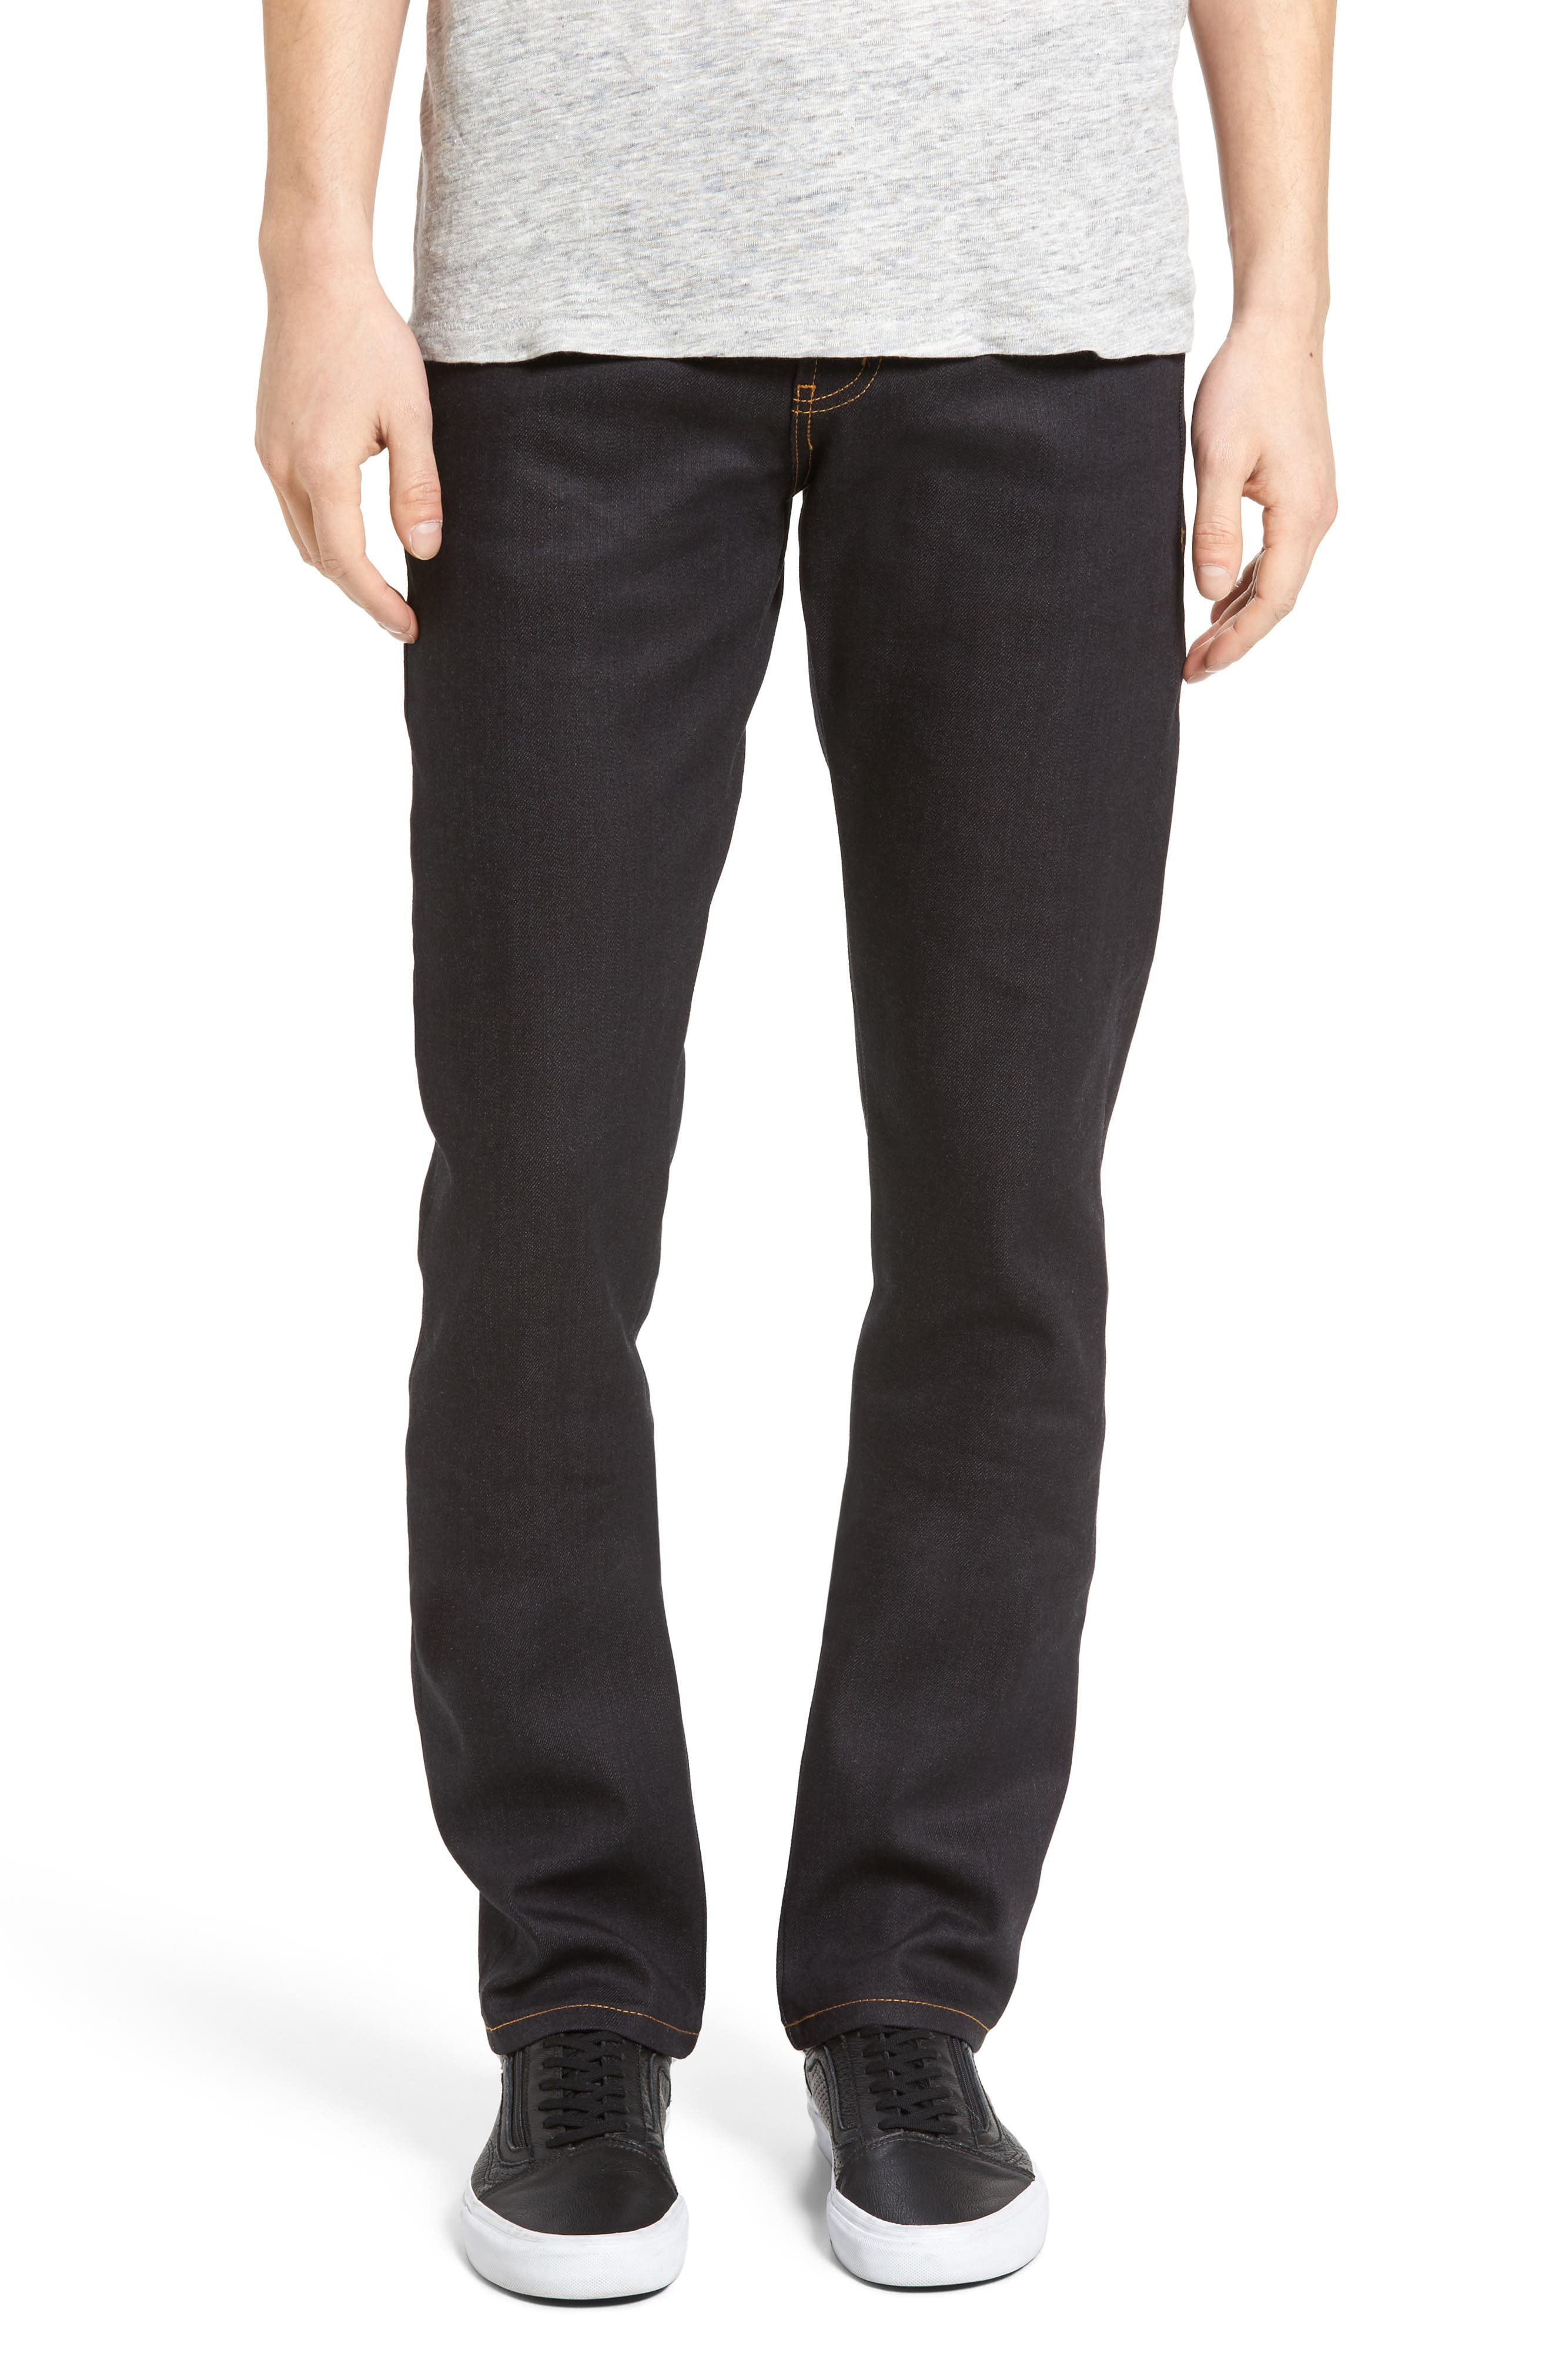 Naked & Famous Denim Skinny Guy Skinny Fit Selvedge Jeans